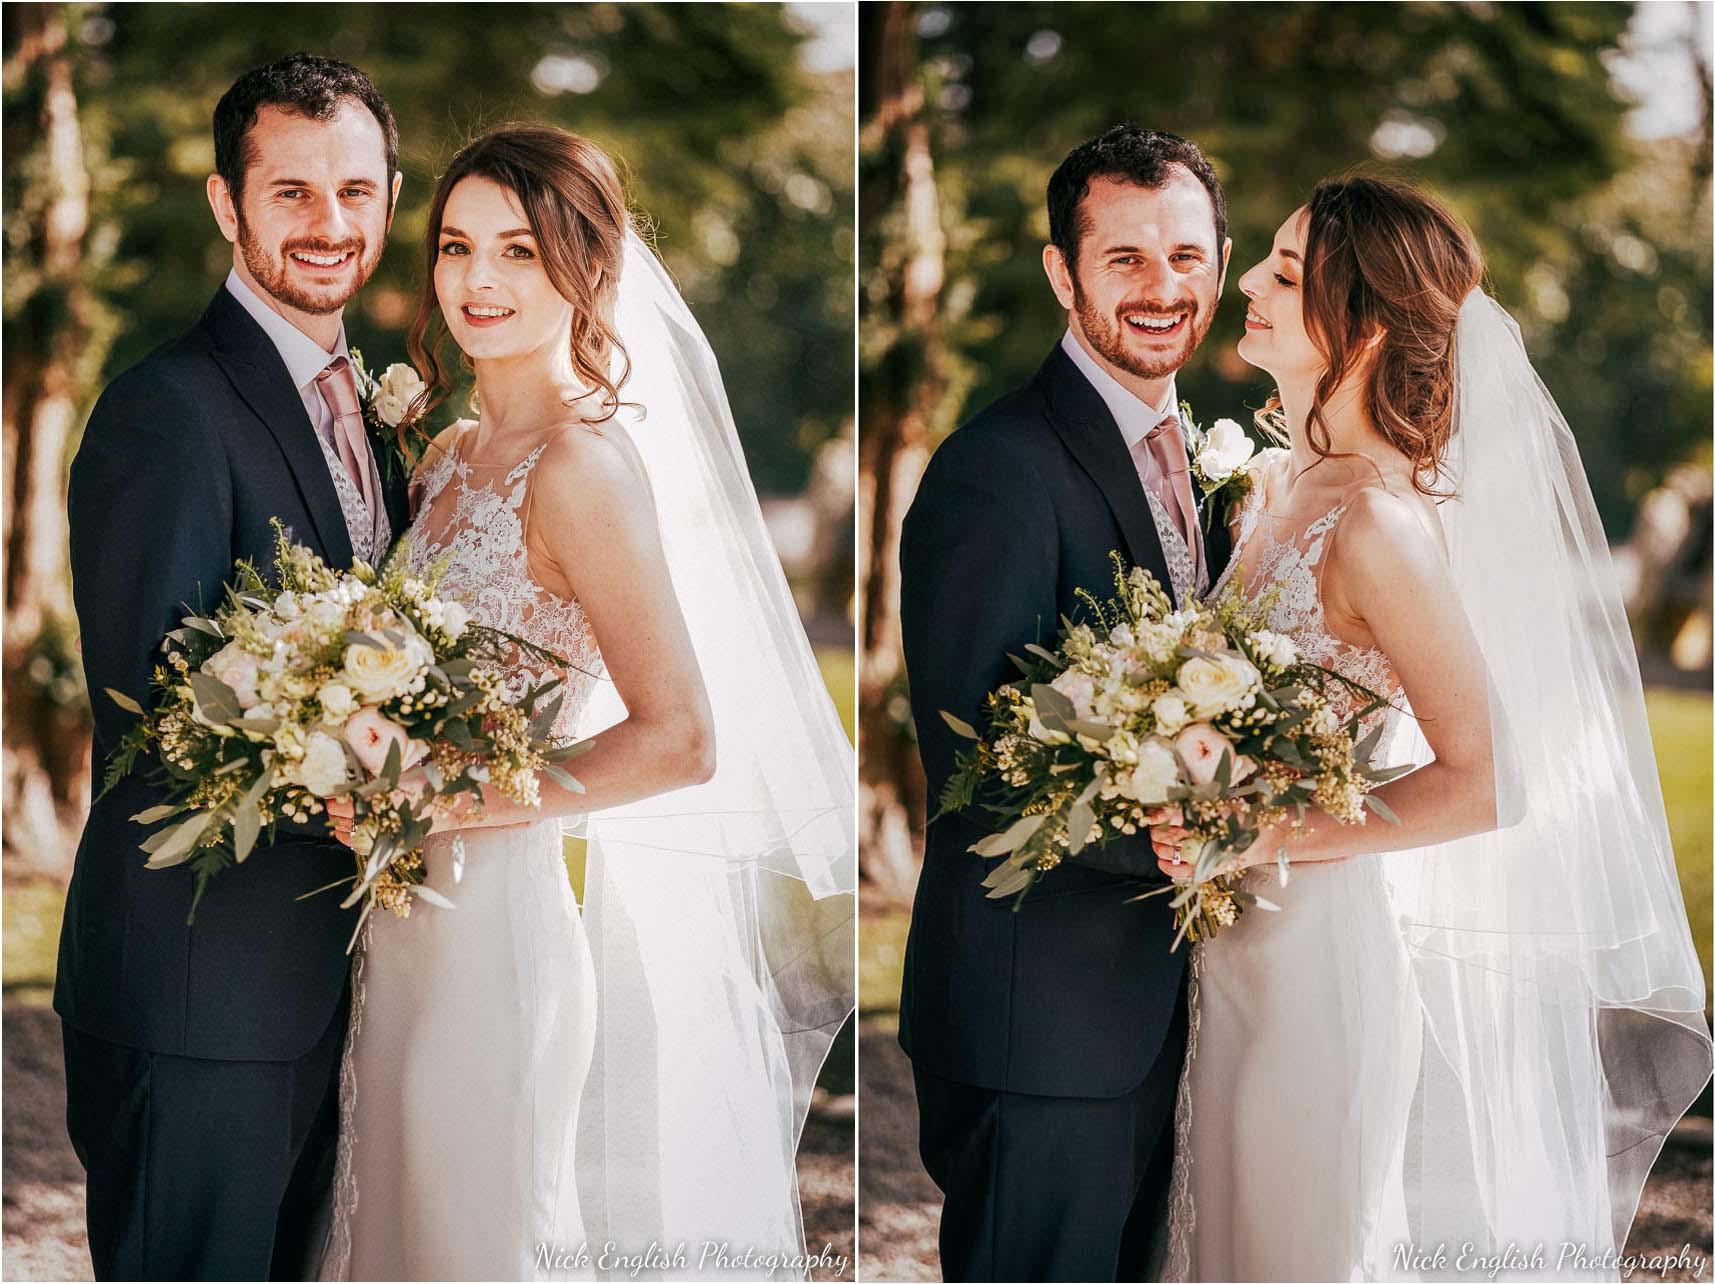 Mitton_Hall_Wedding_Photographer-1-2 copy.jpg